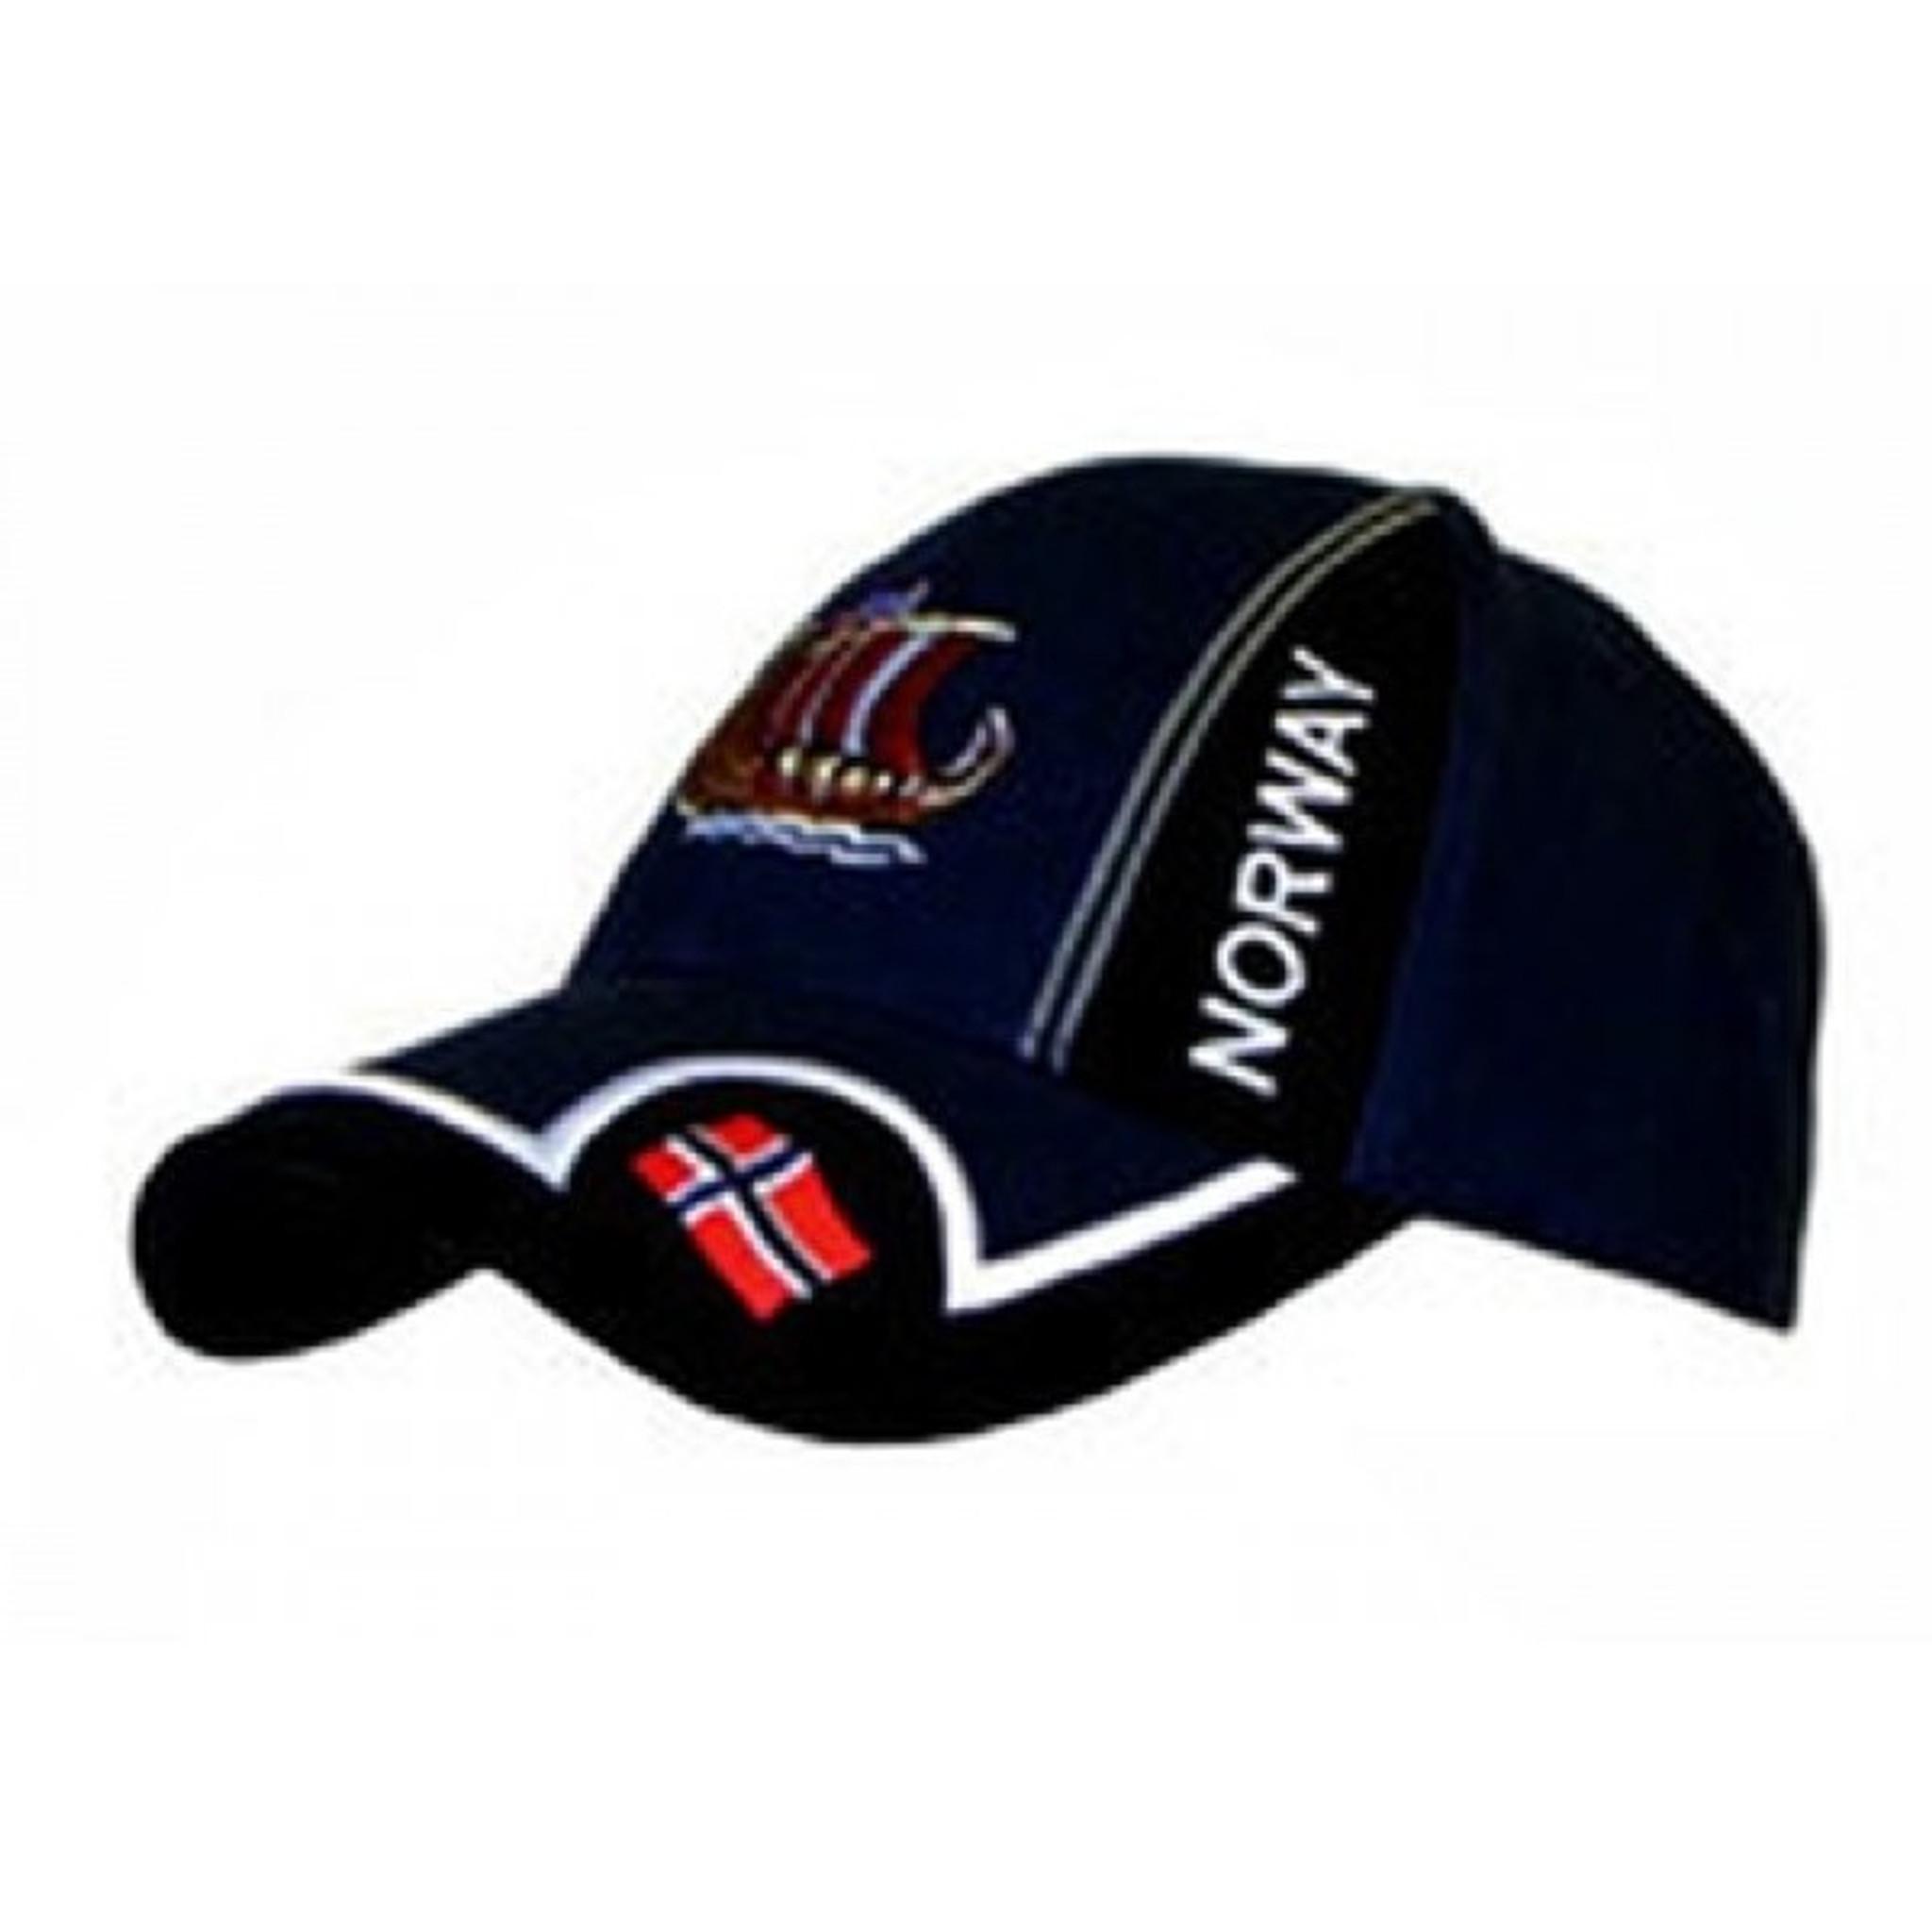 c501214e Norway Viking Ship Ball Cap in Navy